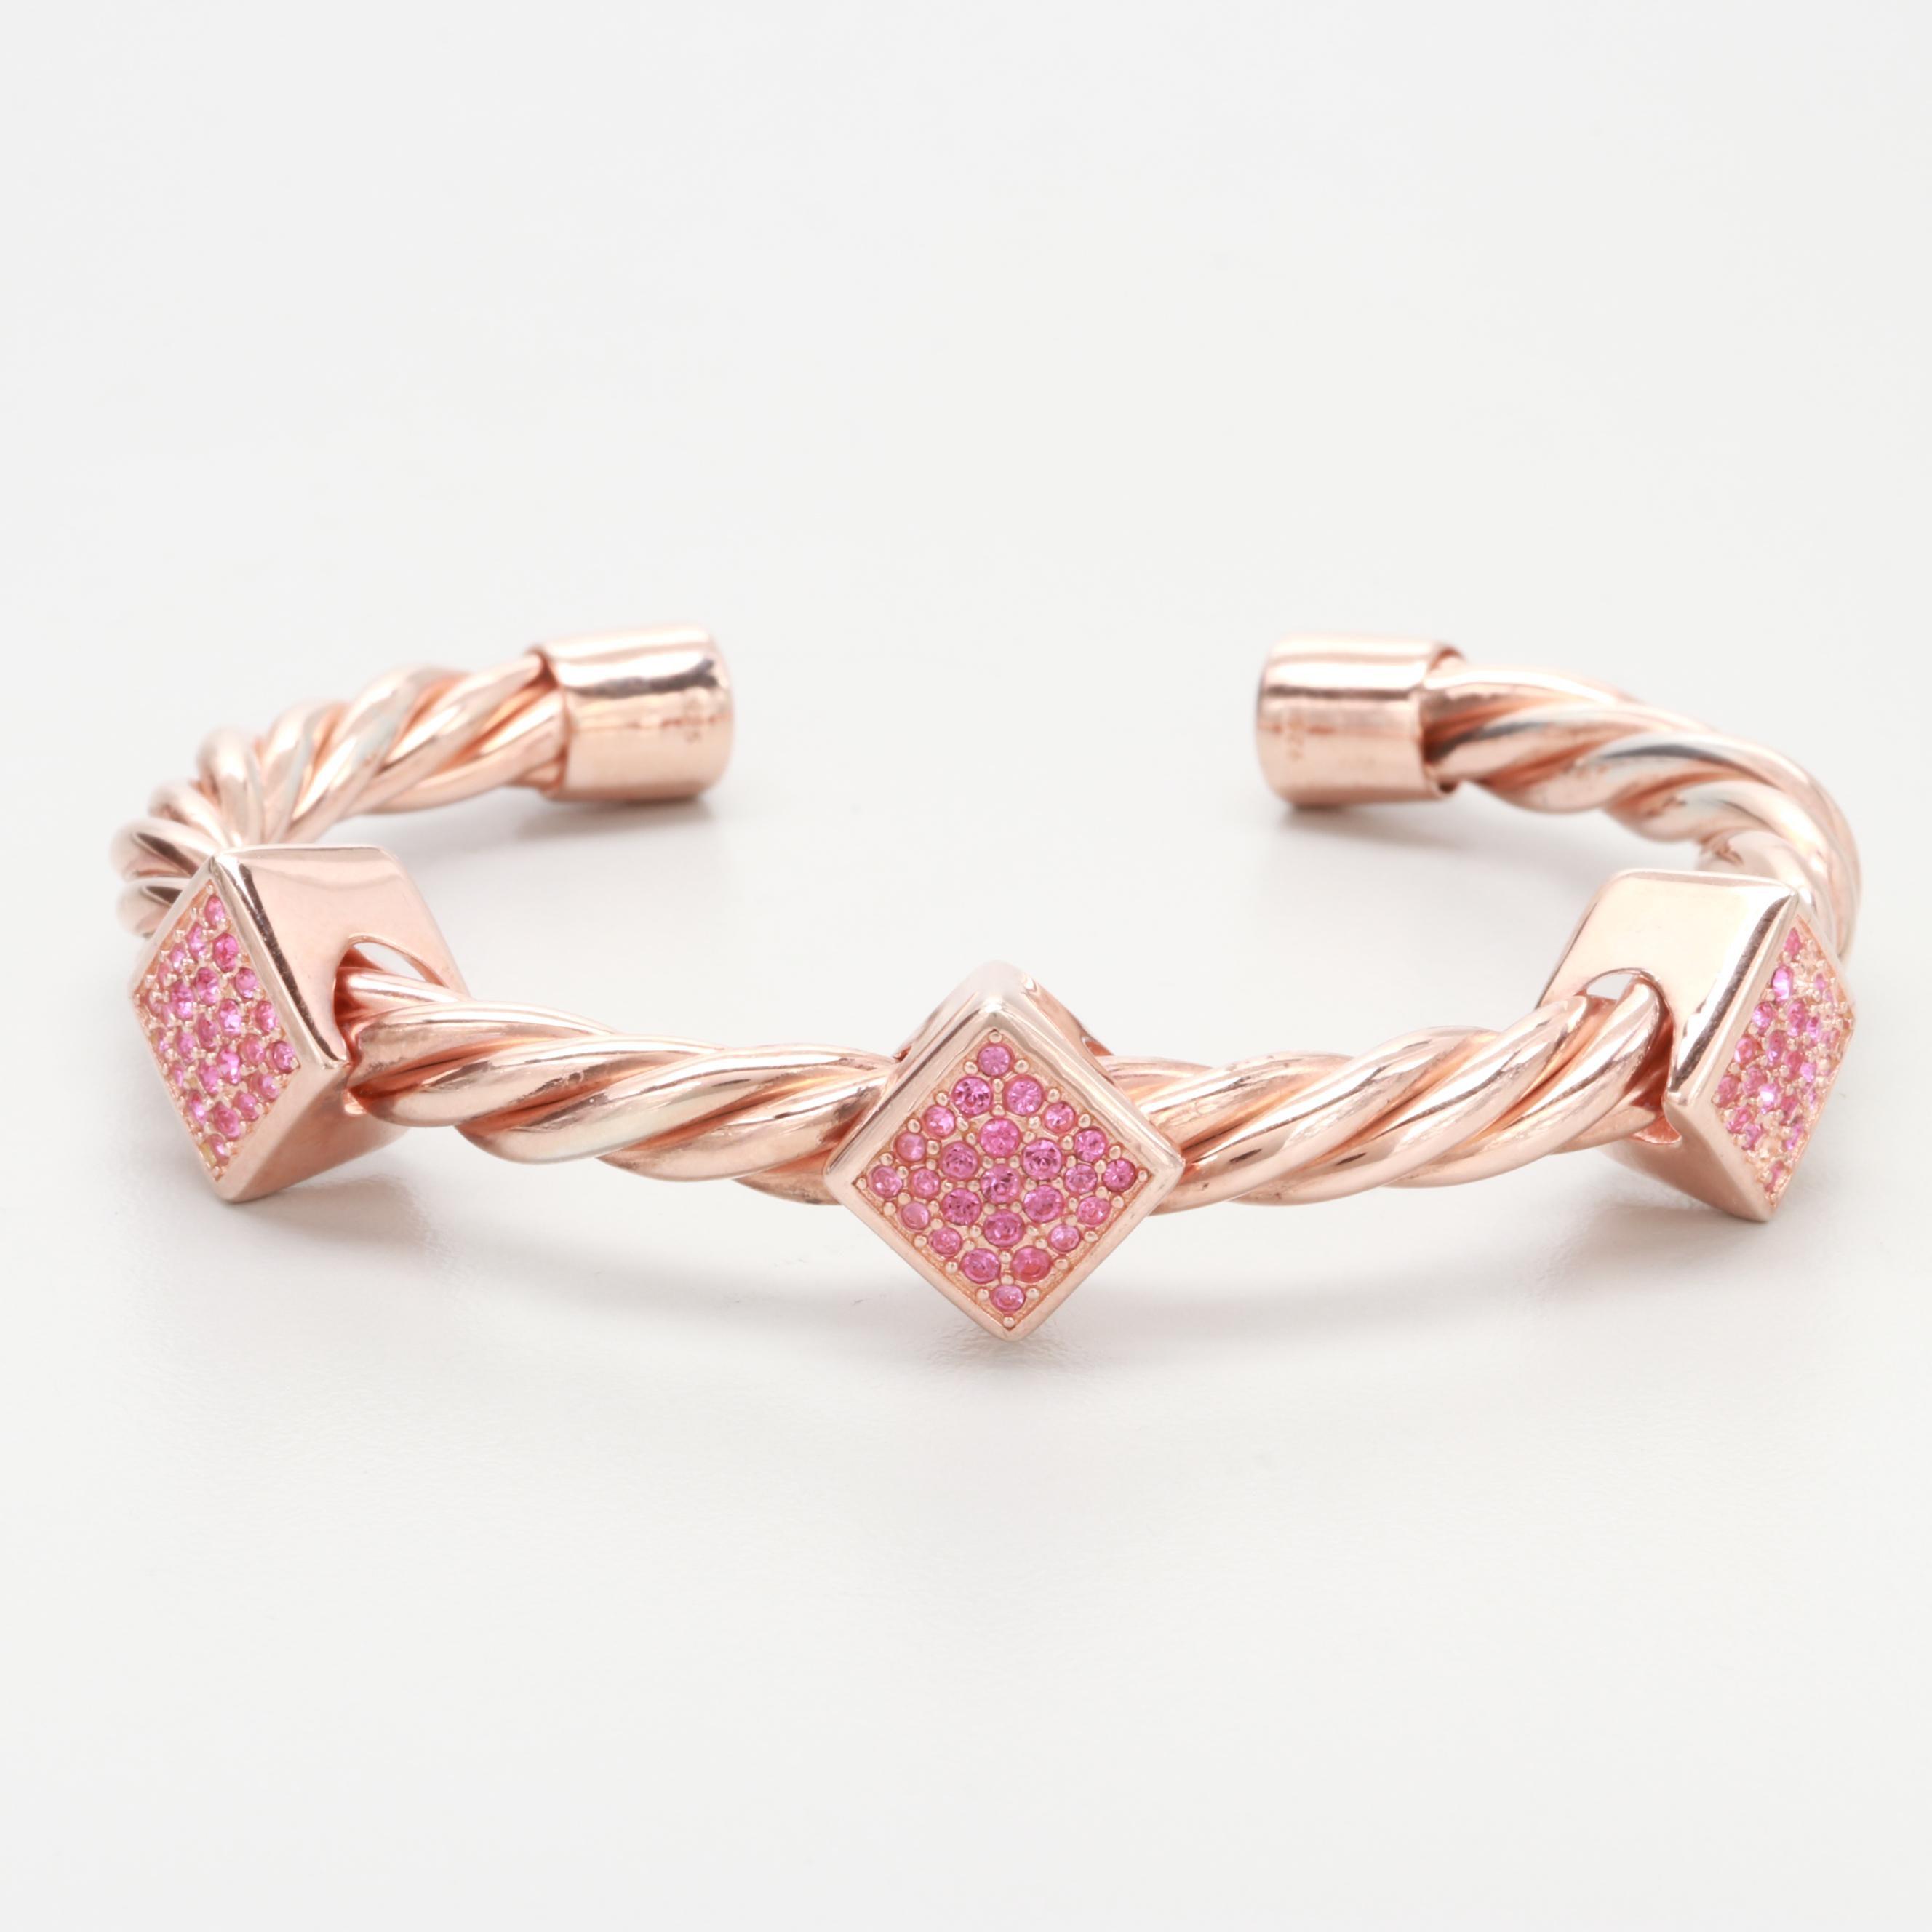 Rose Gold Wash on Sterling Silver Glass Cuff Bracelet